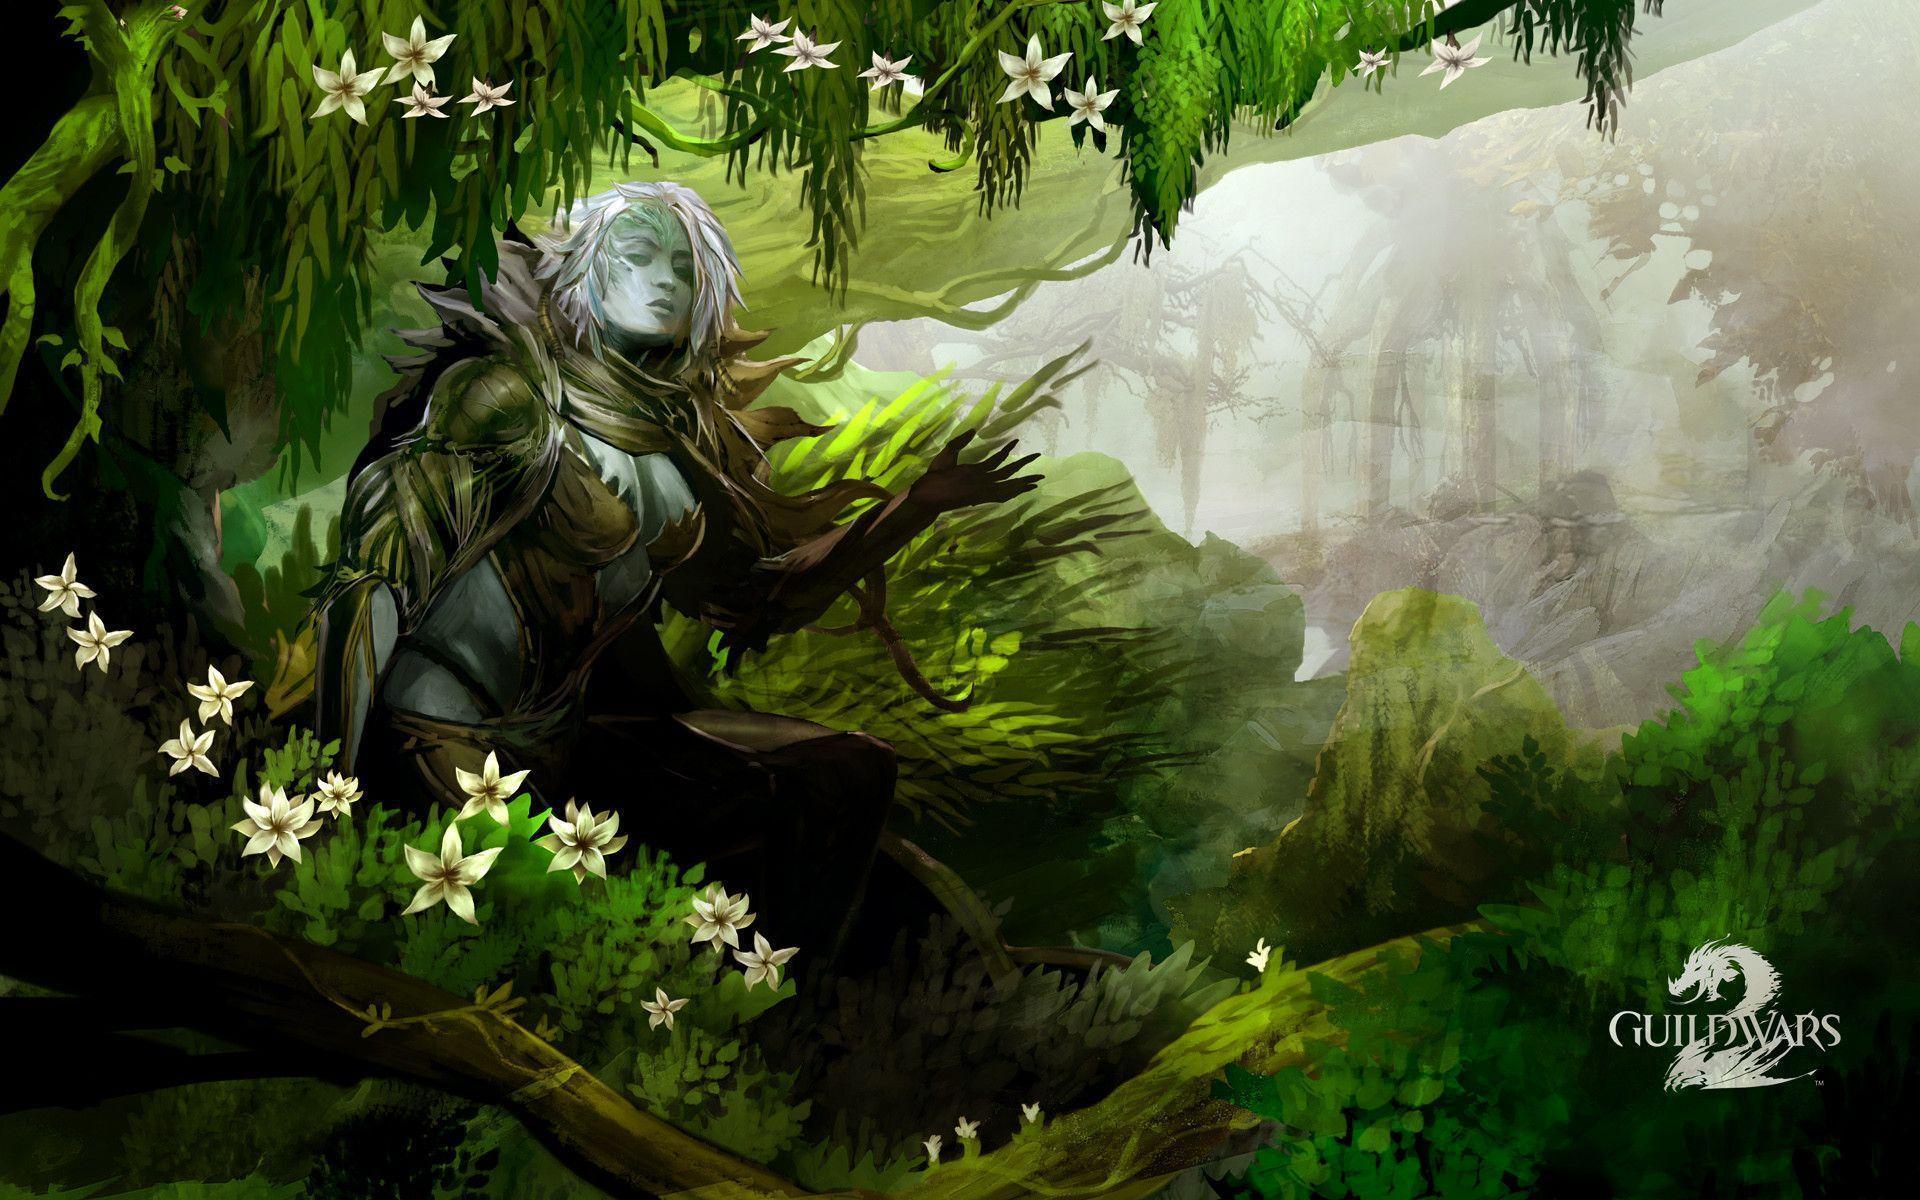 HD Guild Wars 2 Wallpapers - Wallpaper Cave